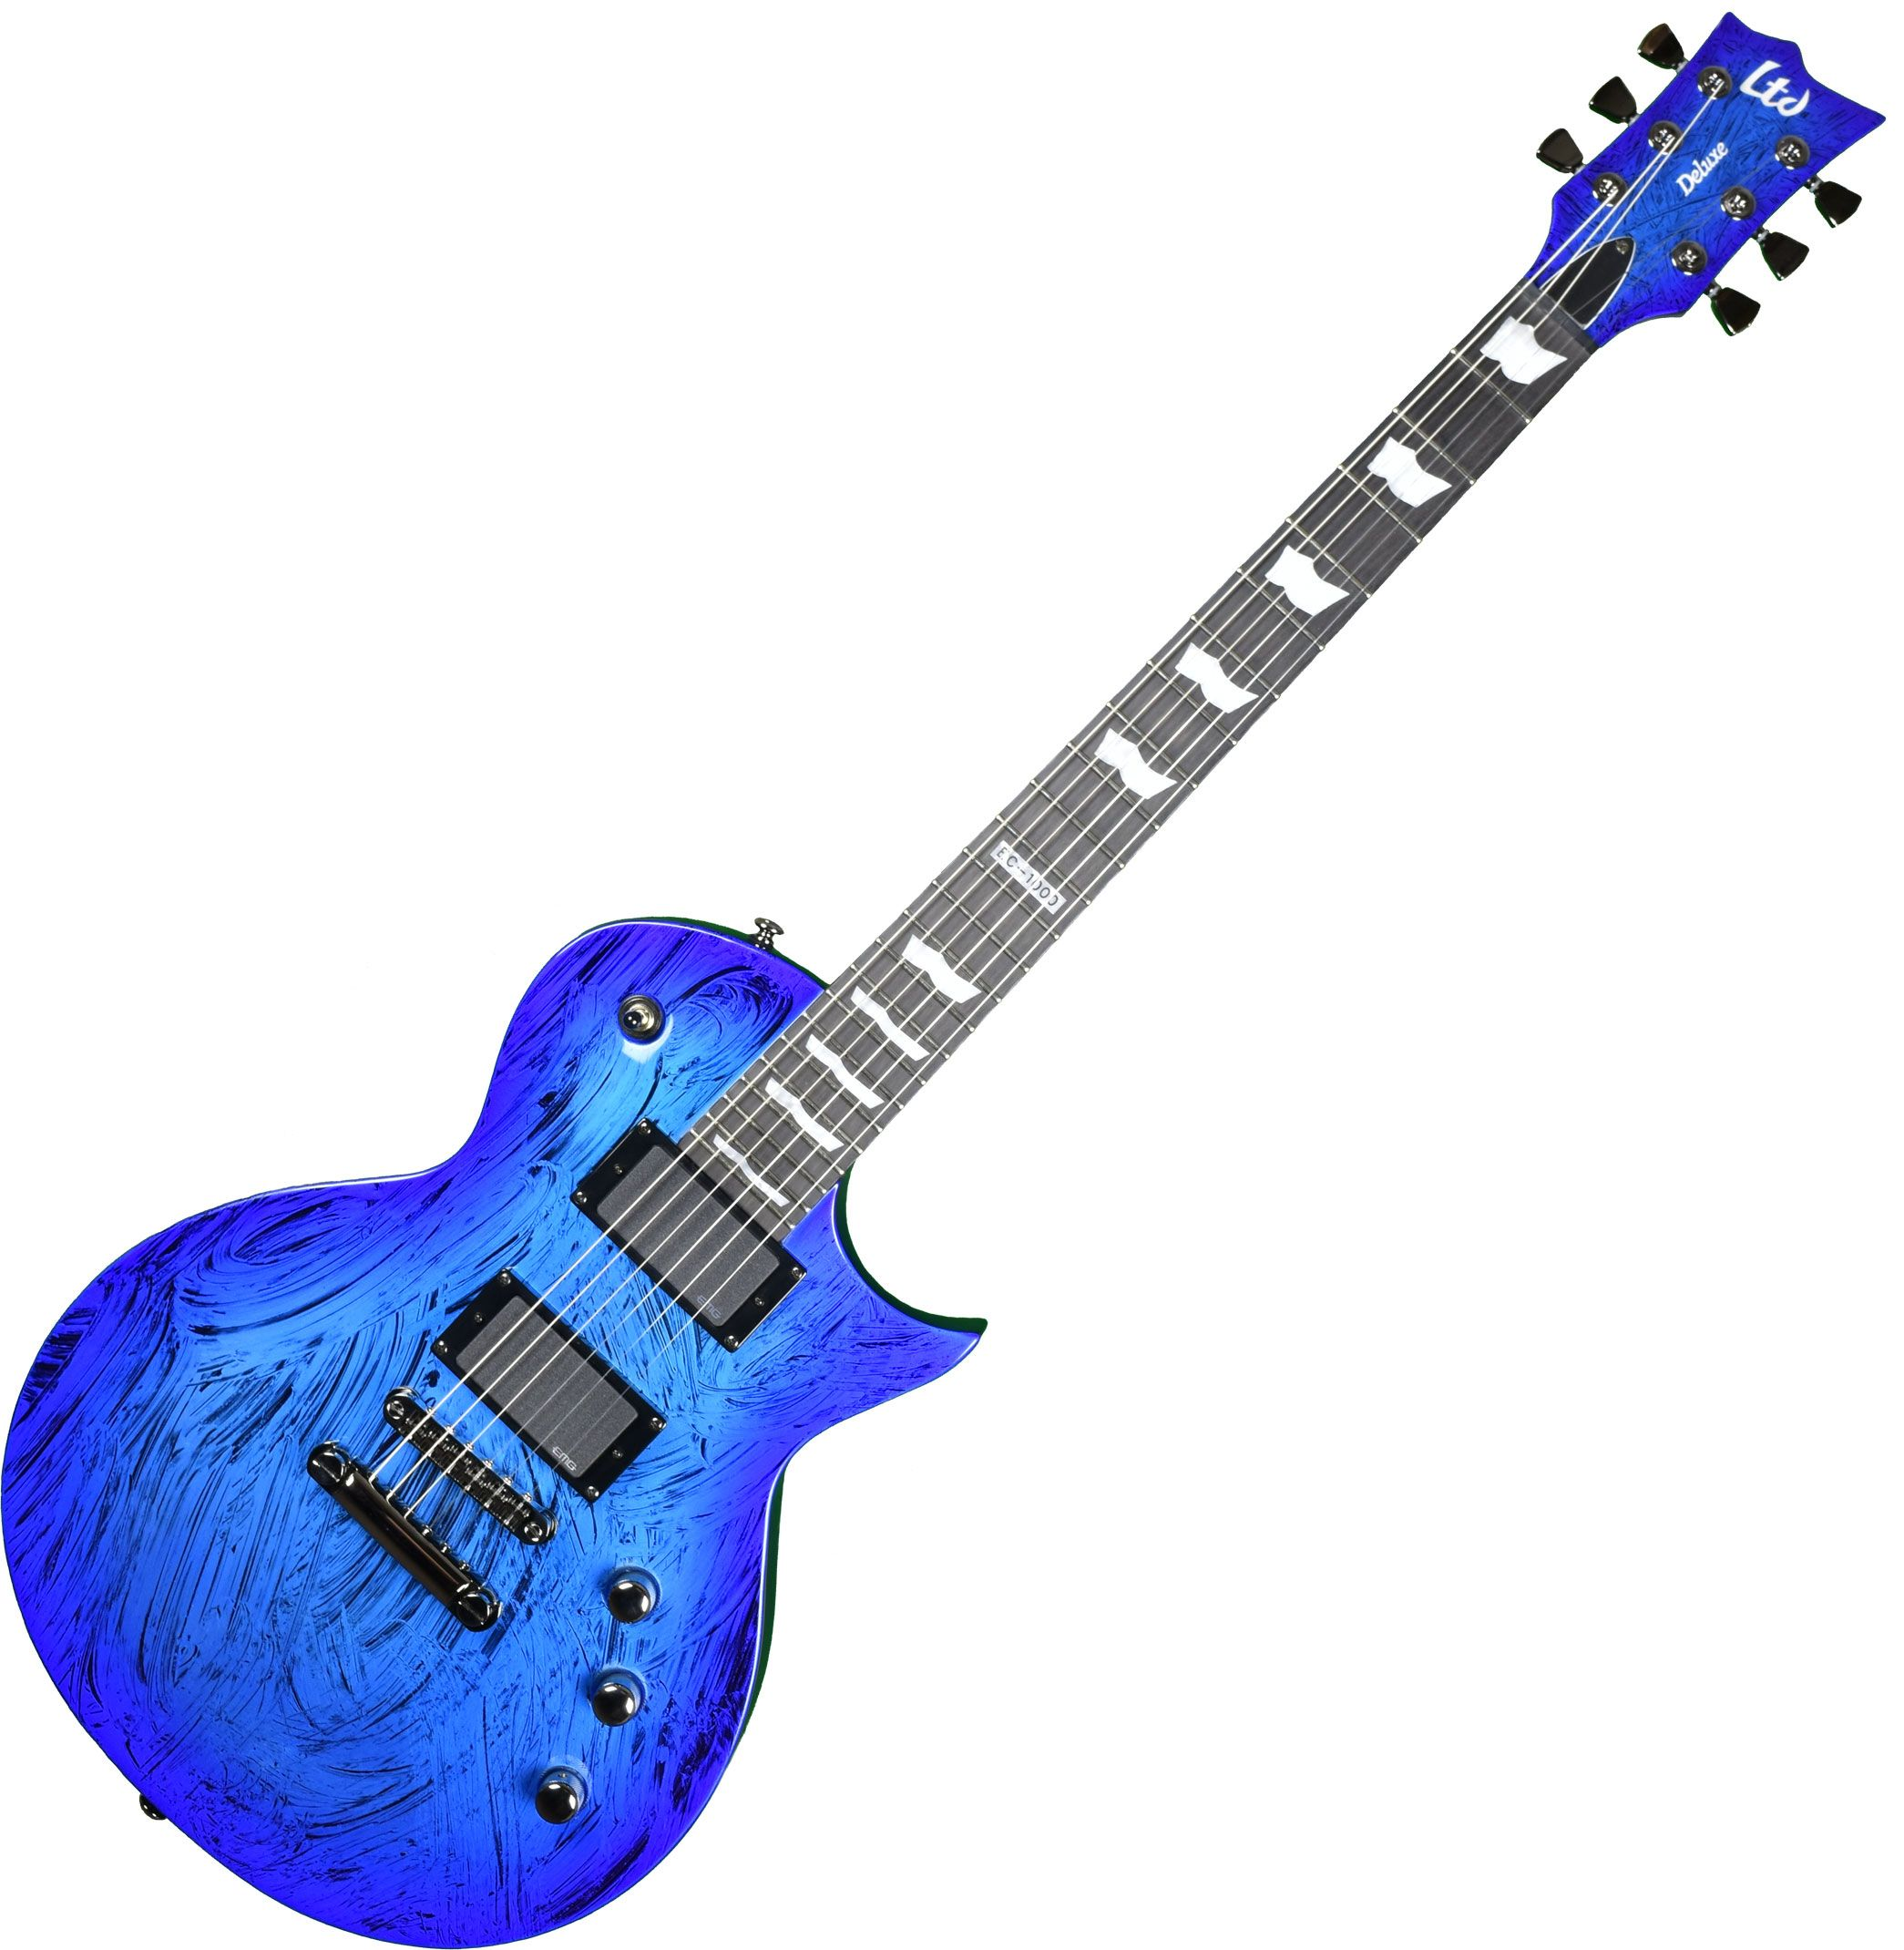 esp ltd deluxe ec 1000 prototype electric guitar swirl blue finish l. Black Bedroom Furniture Sets. Home Design Ideas